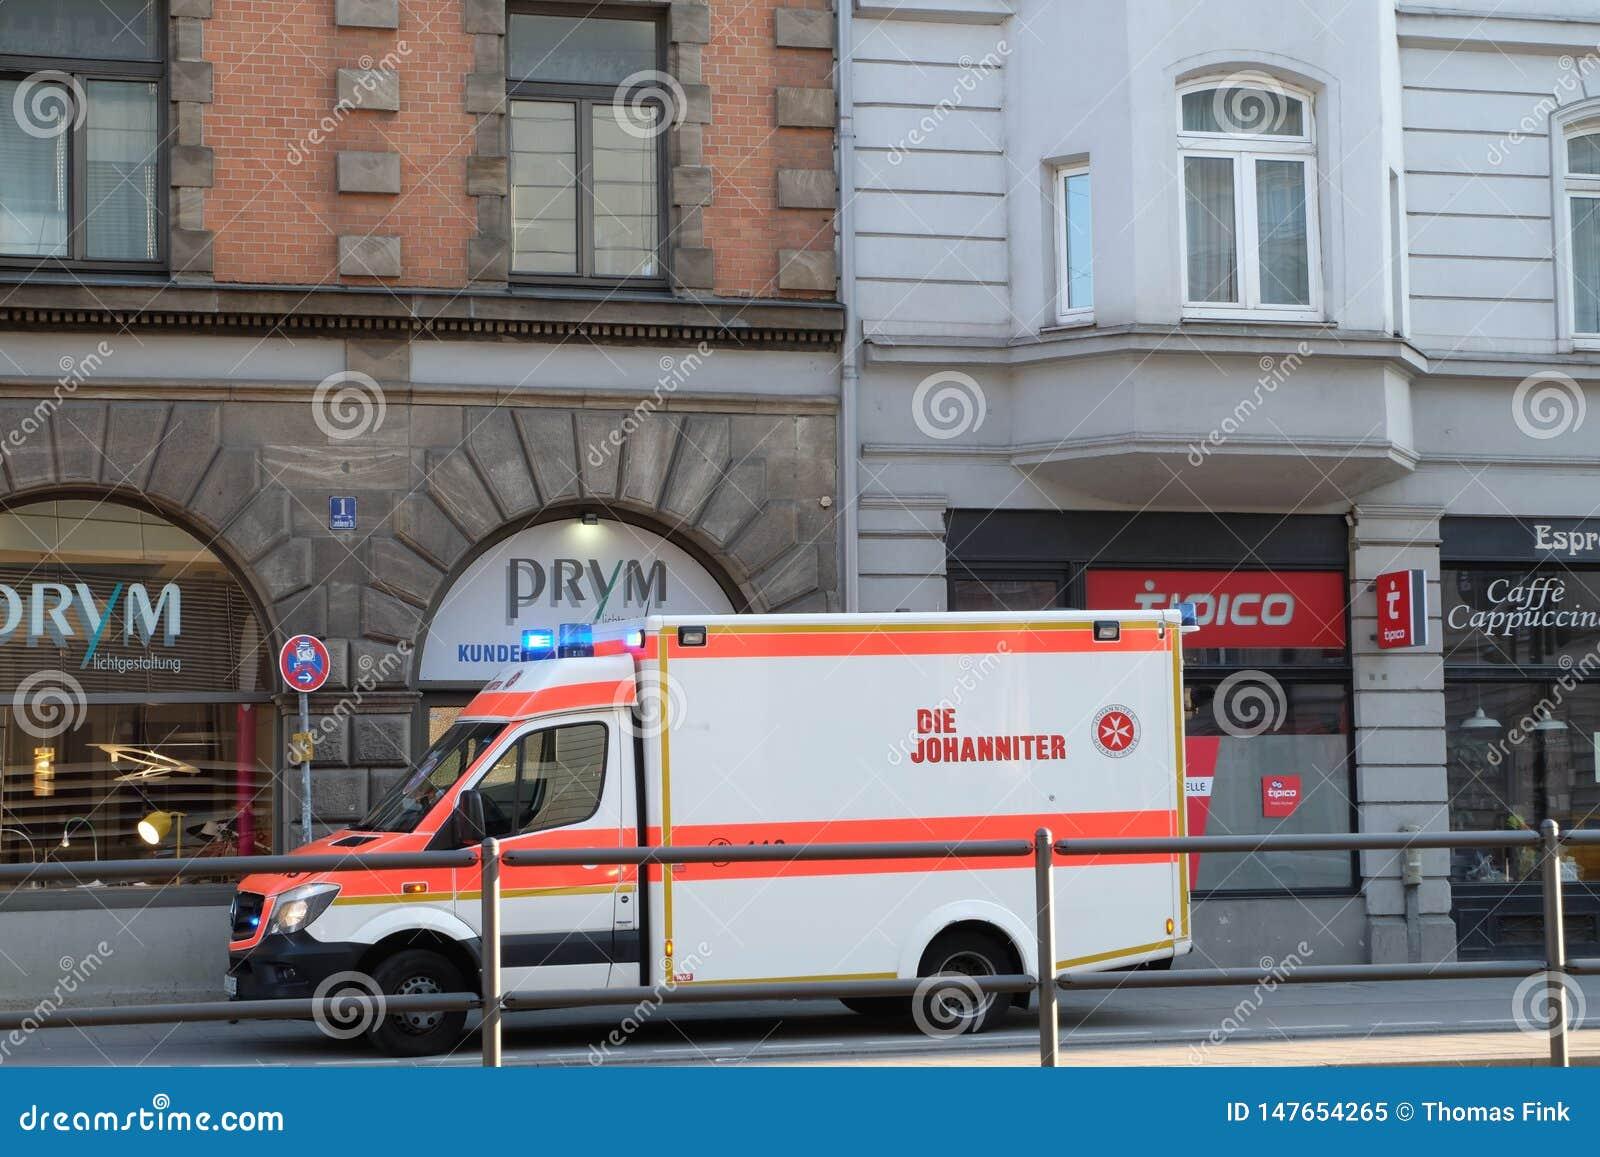 Parked Ambulance in Munich